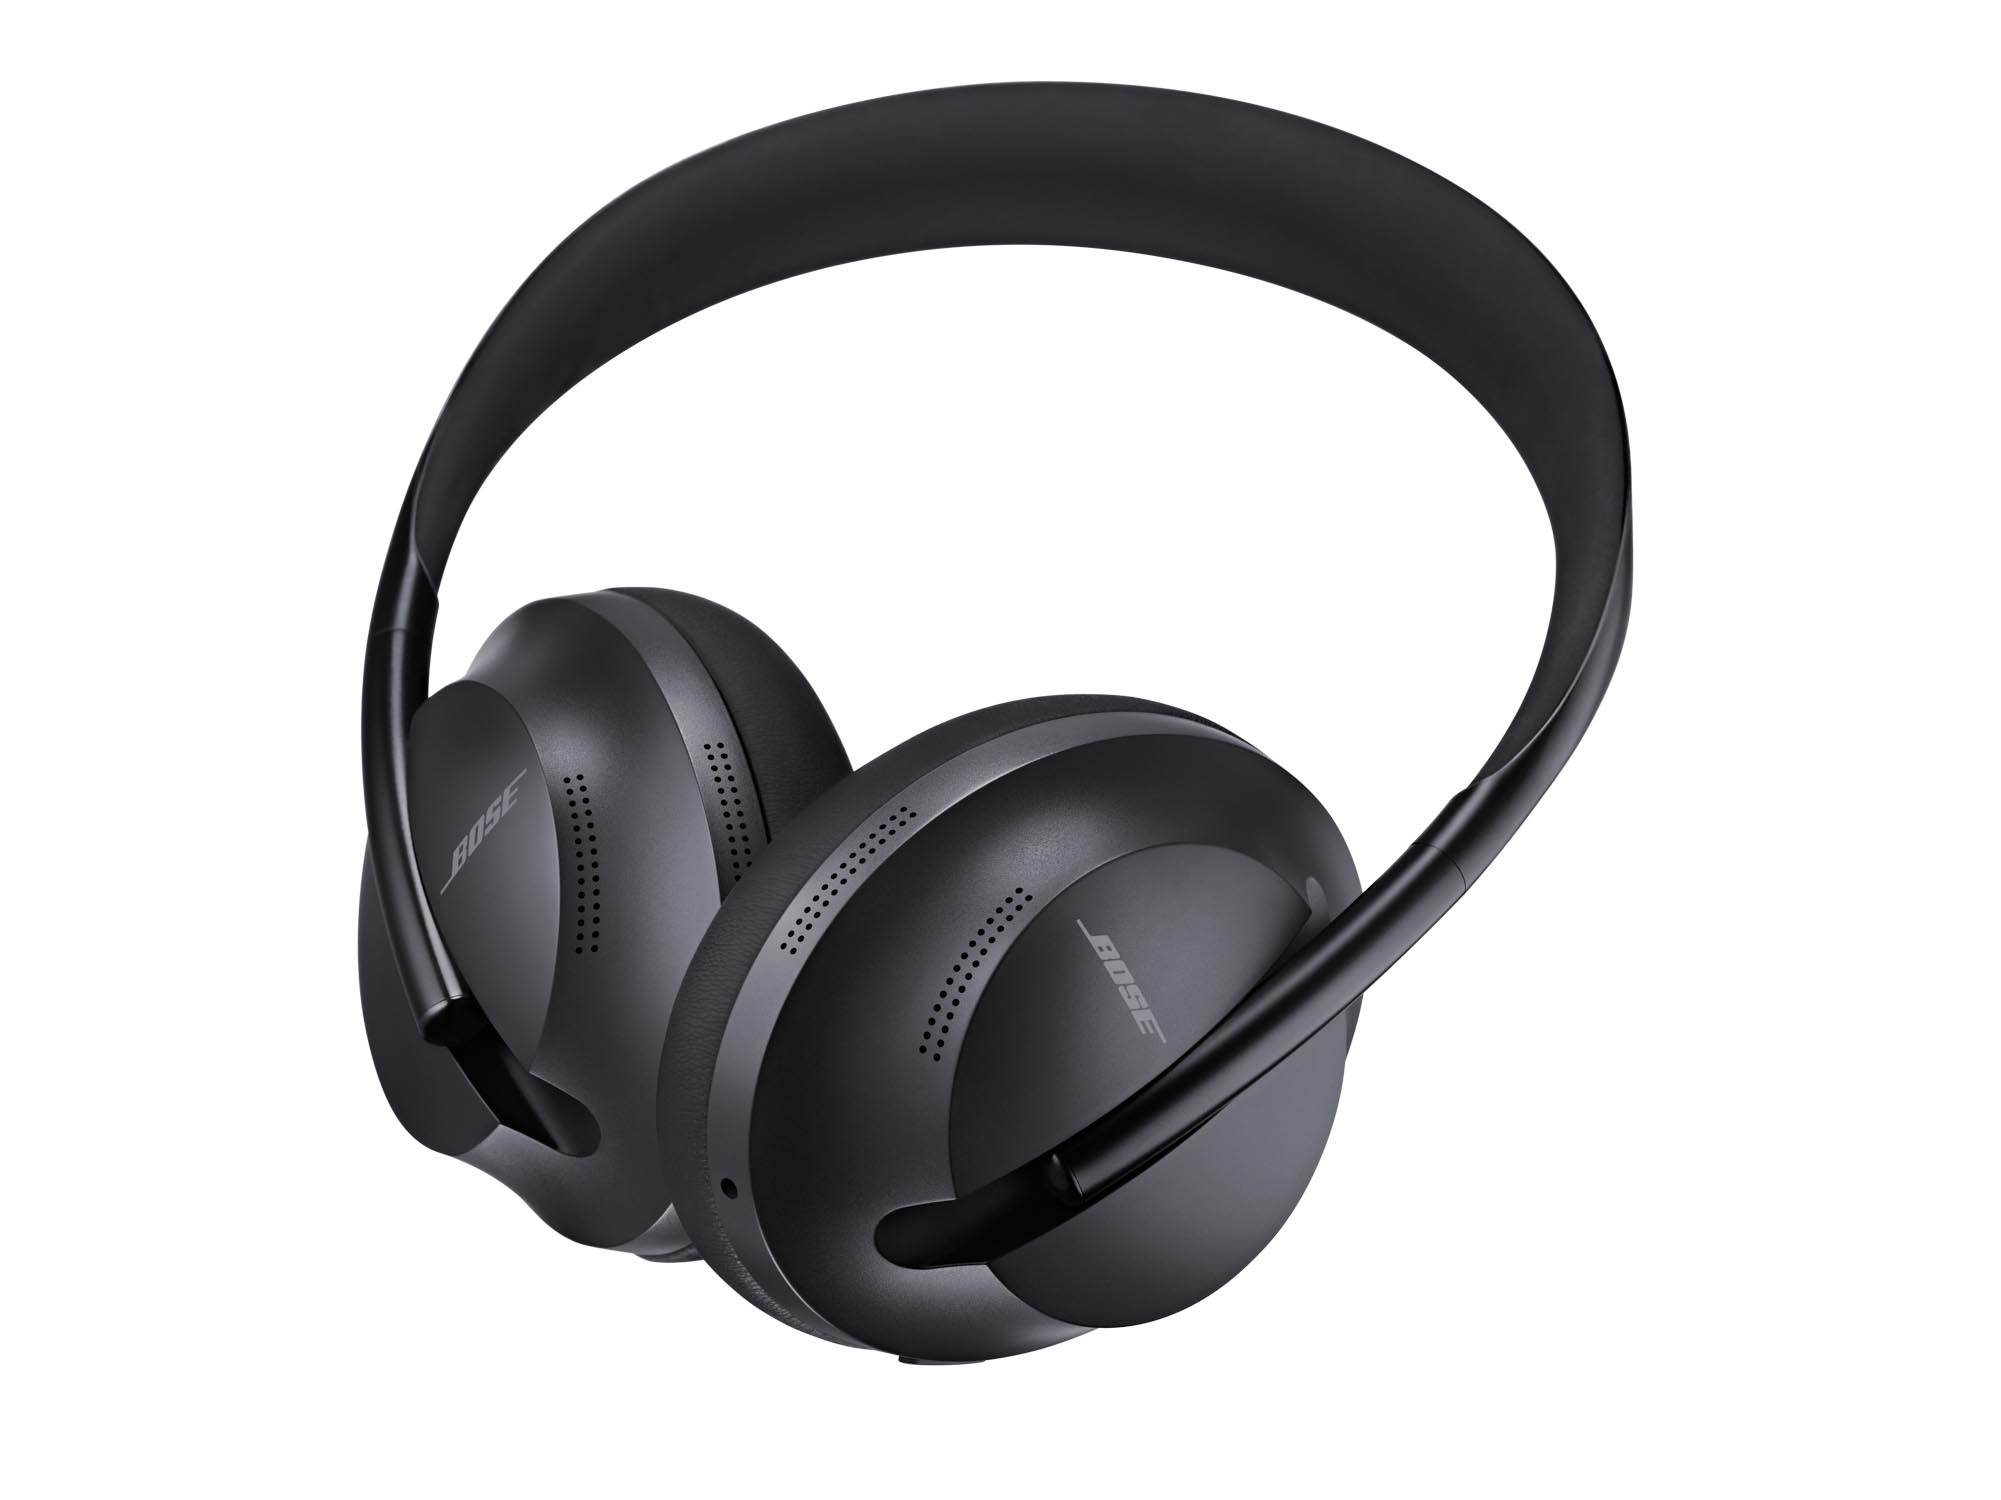 968fb00b6a3f05 Headphones + Earbuds, Over-Ear, Sports & Wireless Headphones   Walmart.com